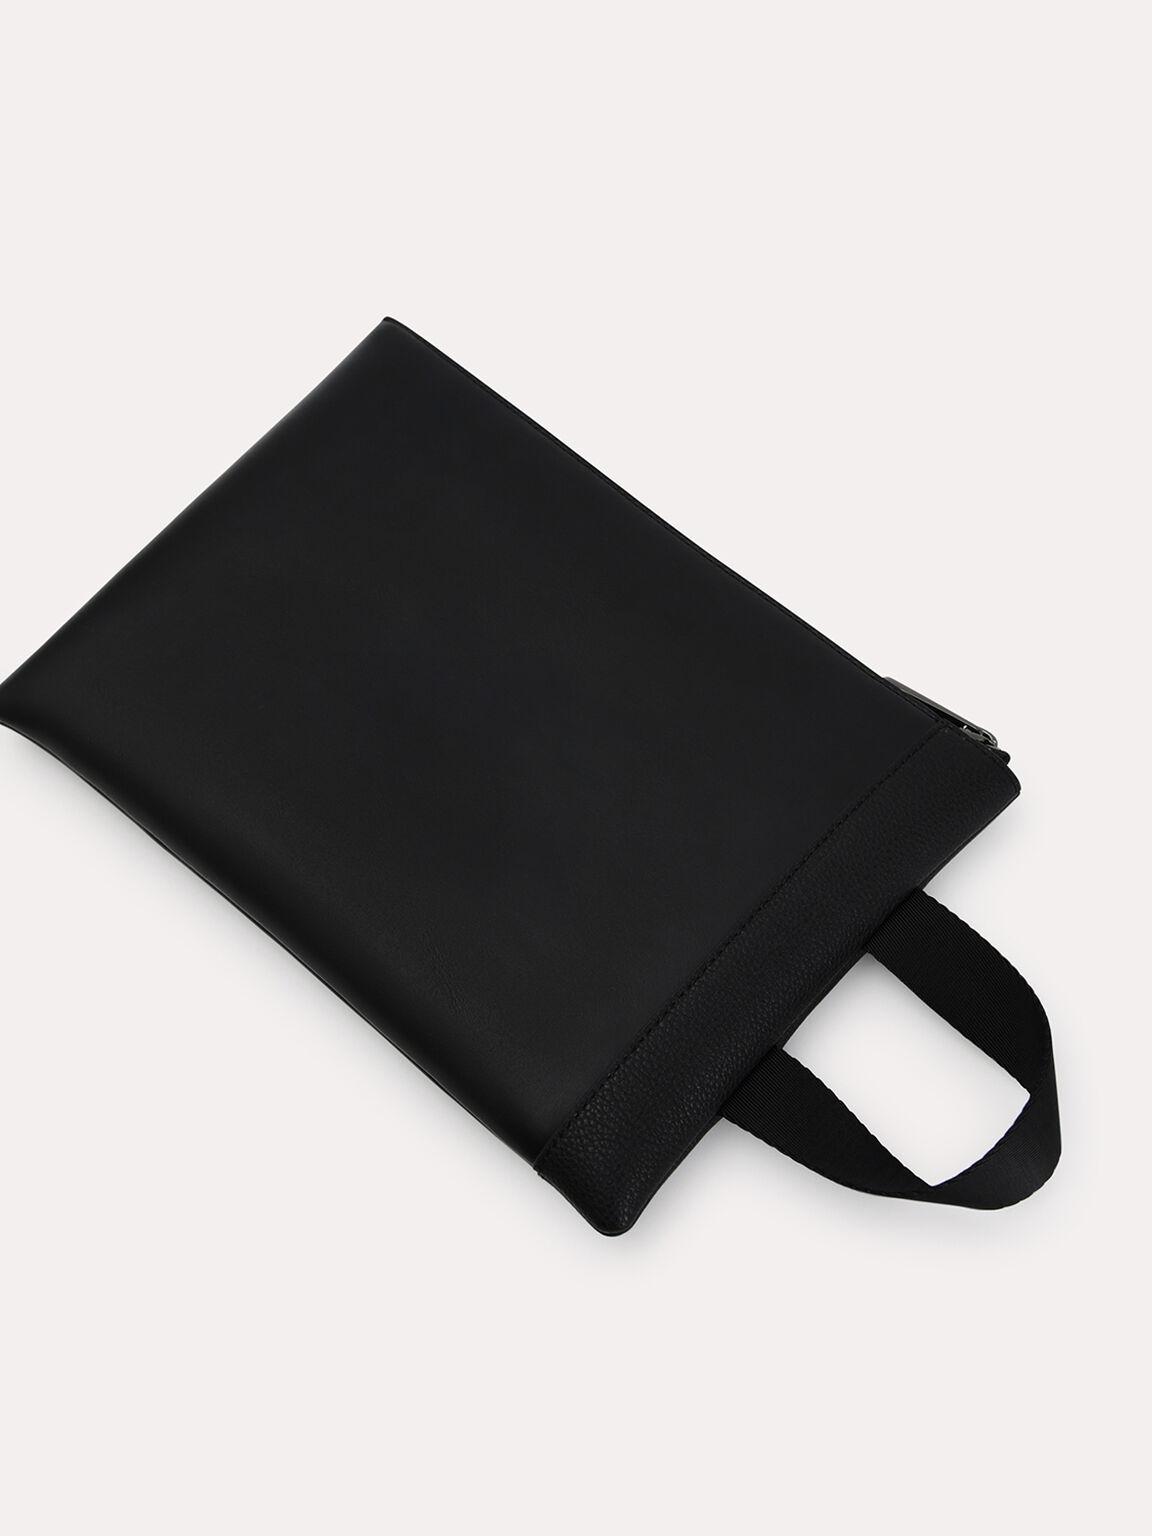 Two-Way Casual Clutch, Black, hi-res